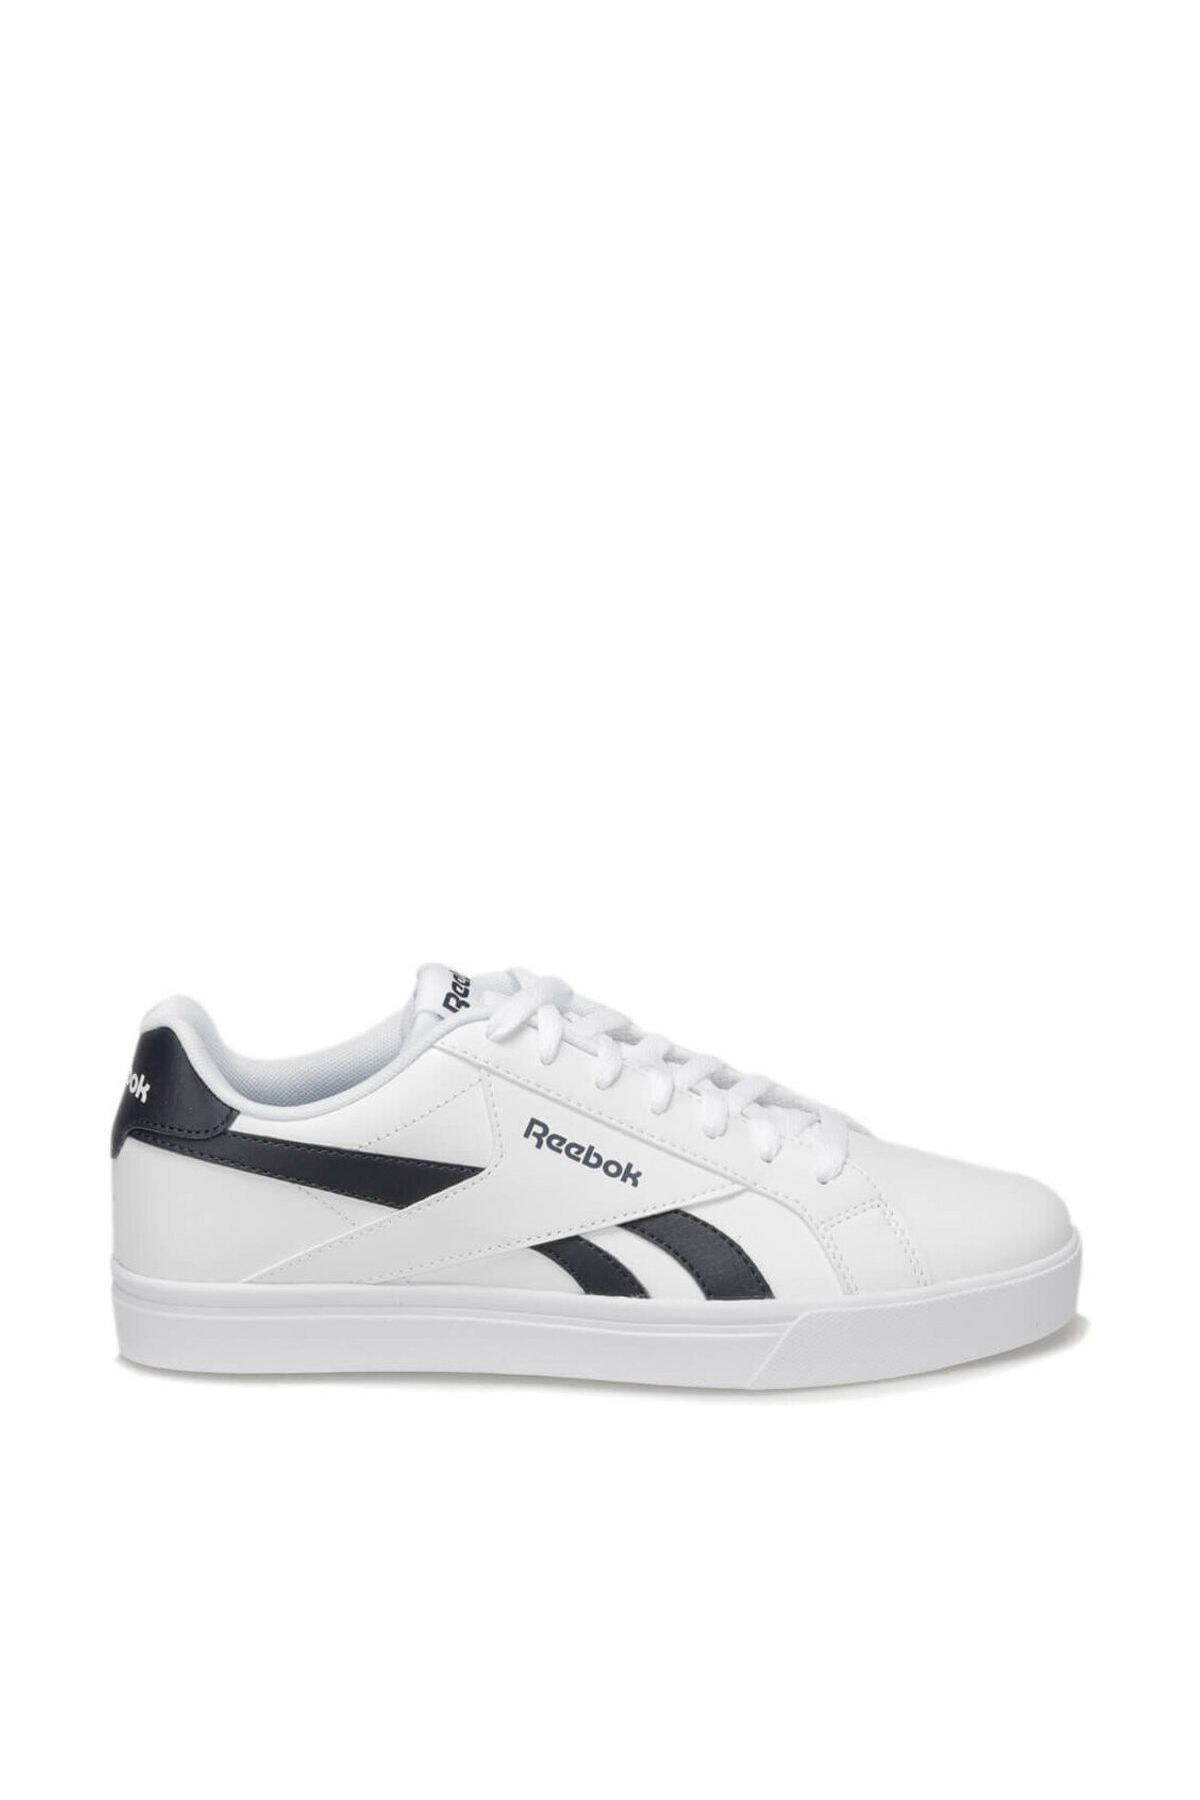 ROYAL COMPLETE3LOW Beyaz Unisex Sneaker Ayakkabı 100481951